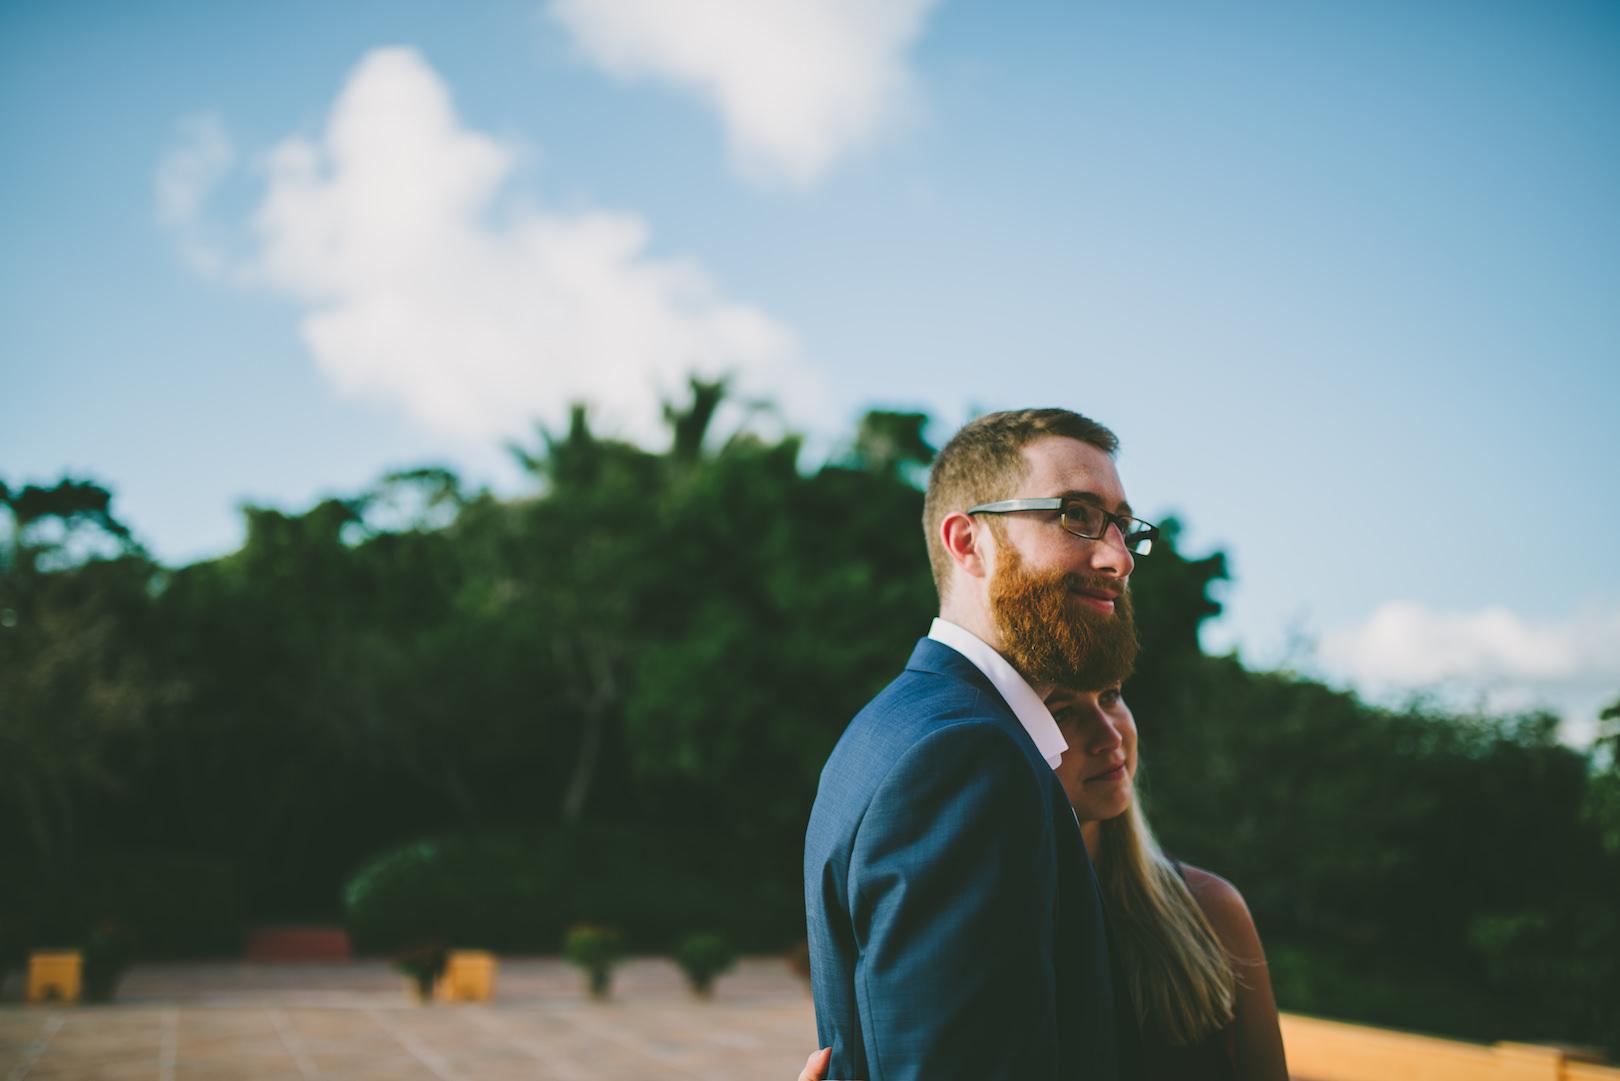 Nathan & Felicia - Wedding Day - © Dallas Kolotylo Photography - 402